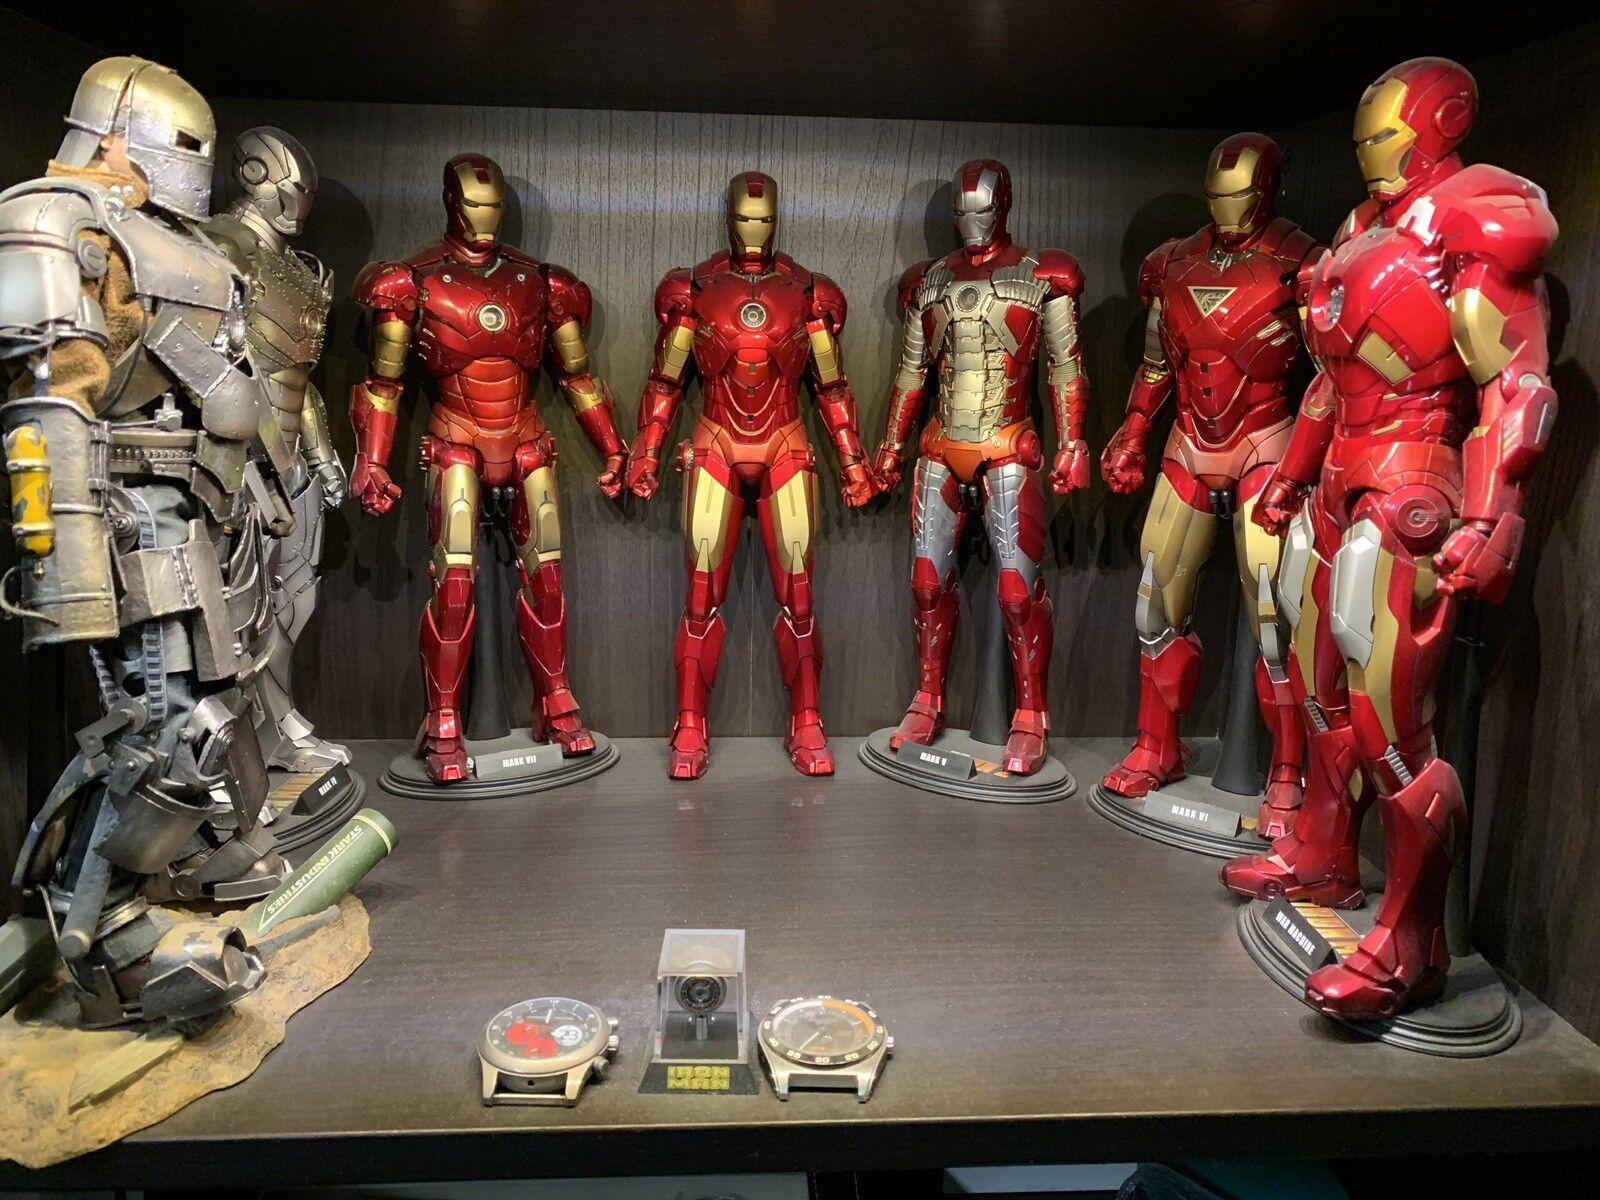 Hot Toys Iron Iron Iron Man Mark 1,2,3,4,5,6,7 Collection 3478fc